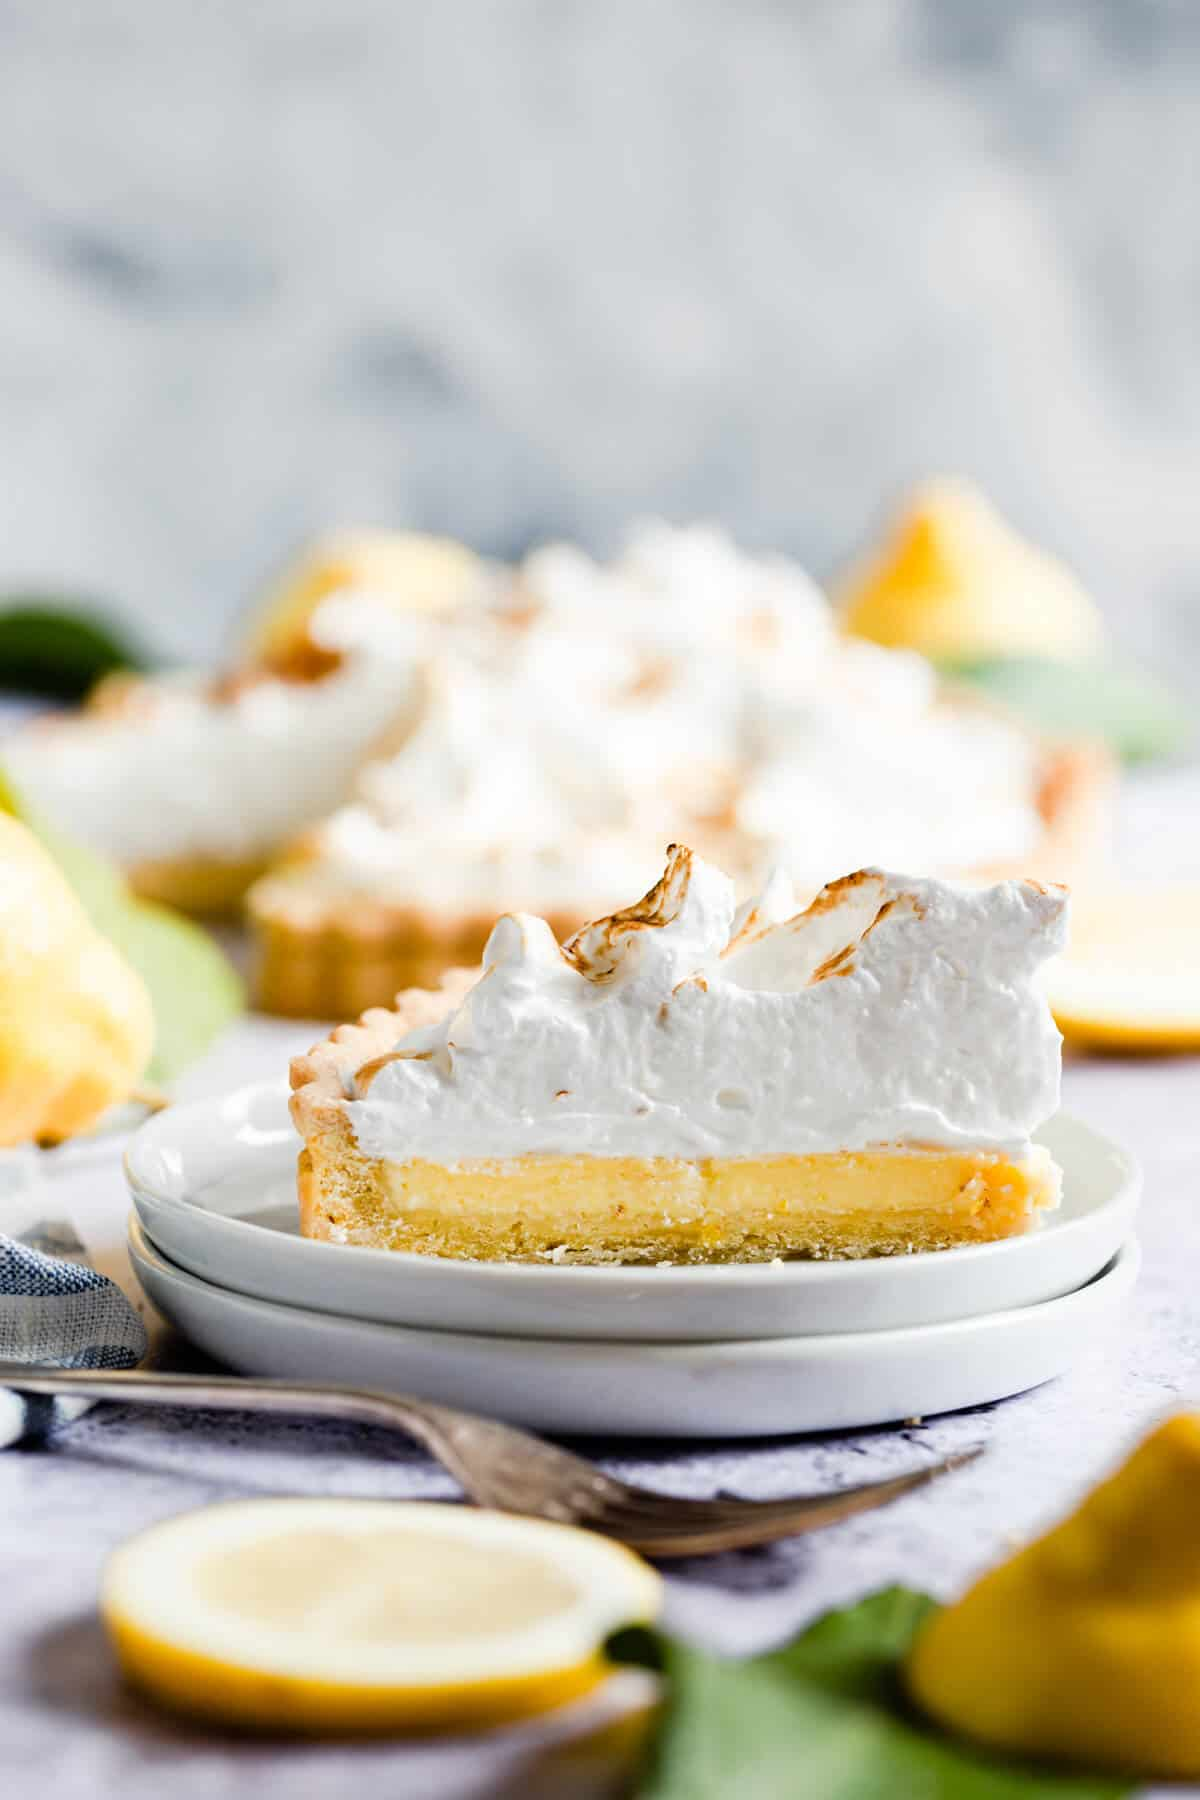 side close up of individual slice of lemon meringue pie